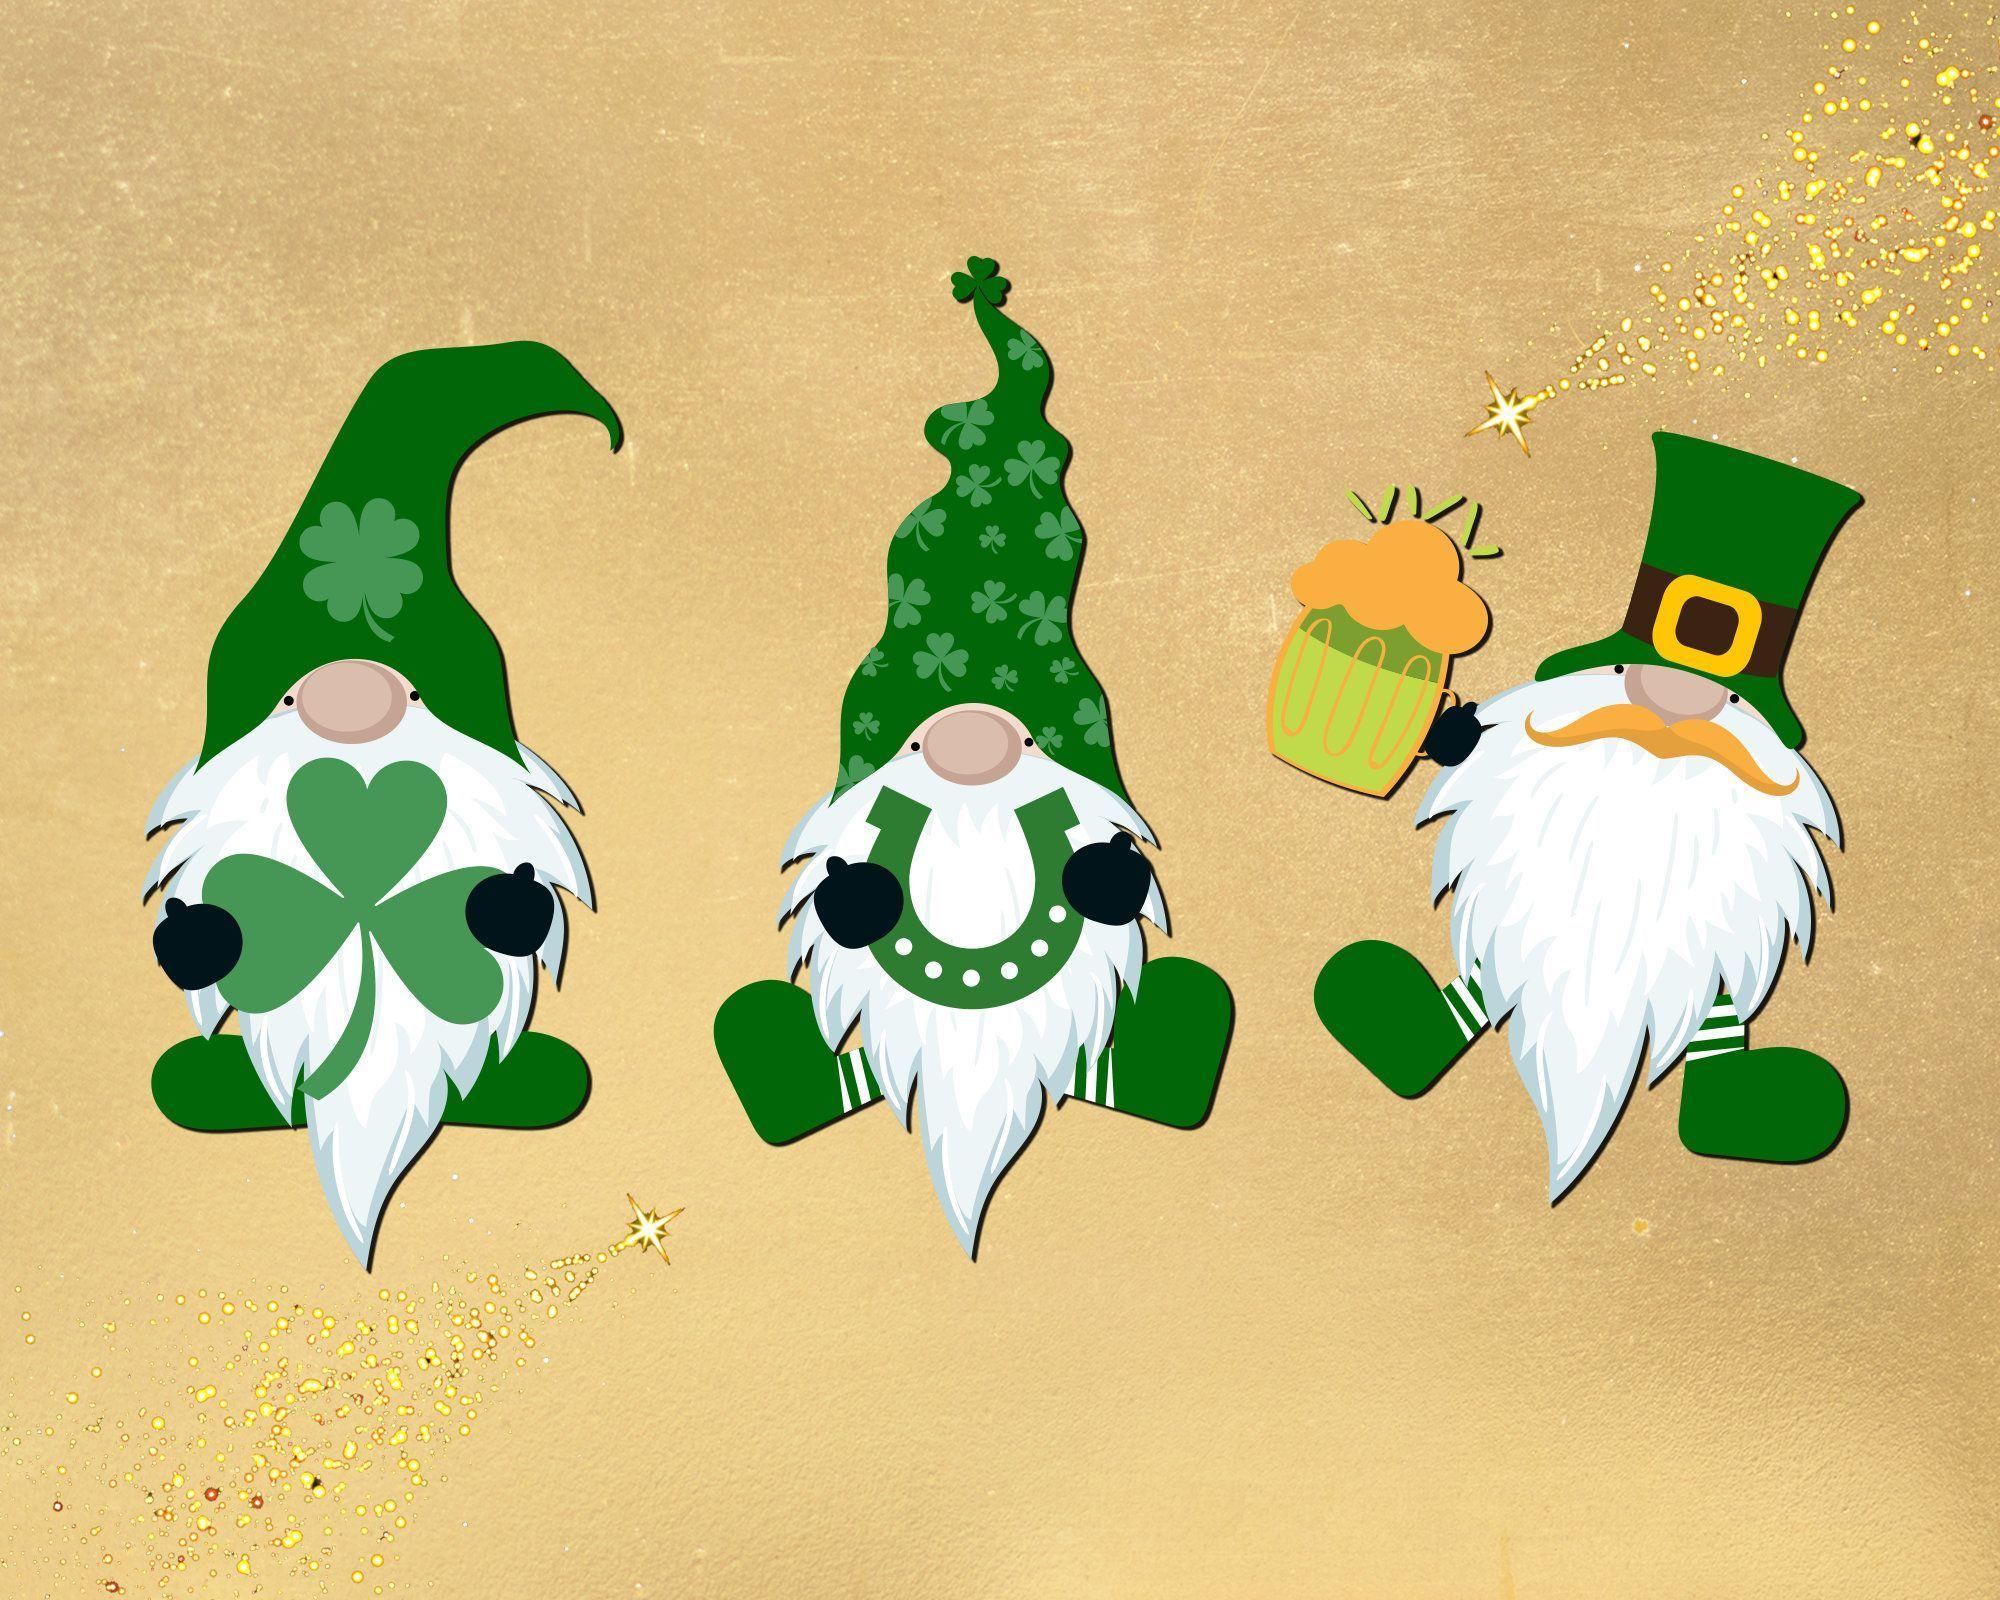 Clover SVG Gnomes SVG for Patrick day St Patricks Day print for t-shirt Gnome Shamrock SVG for cricut